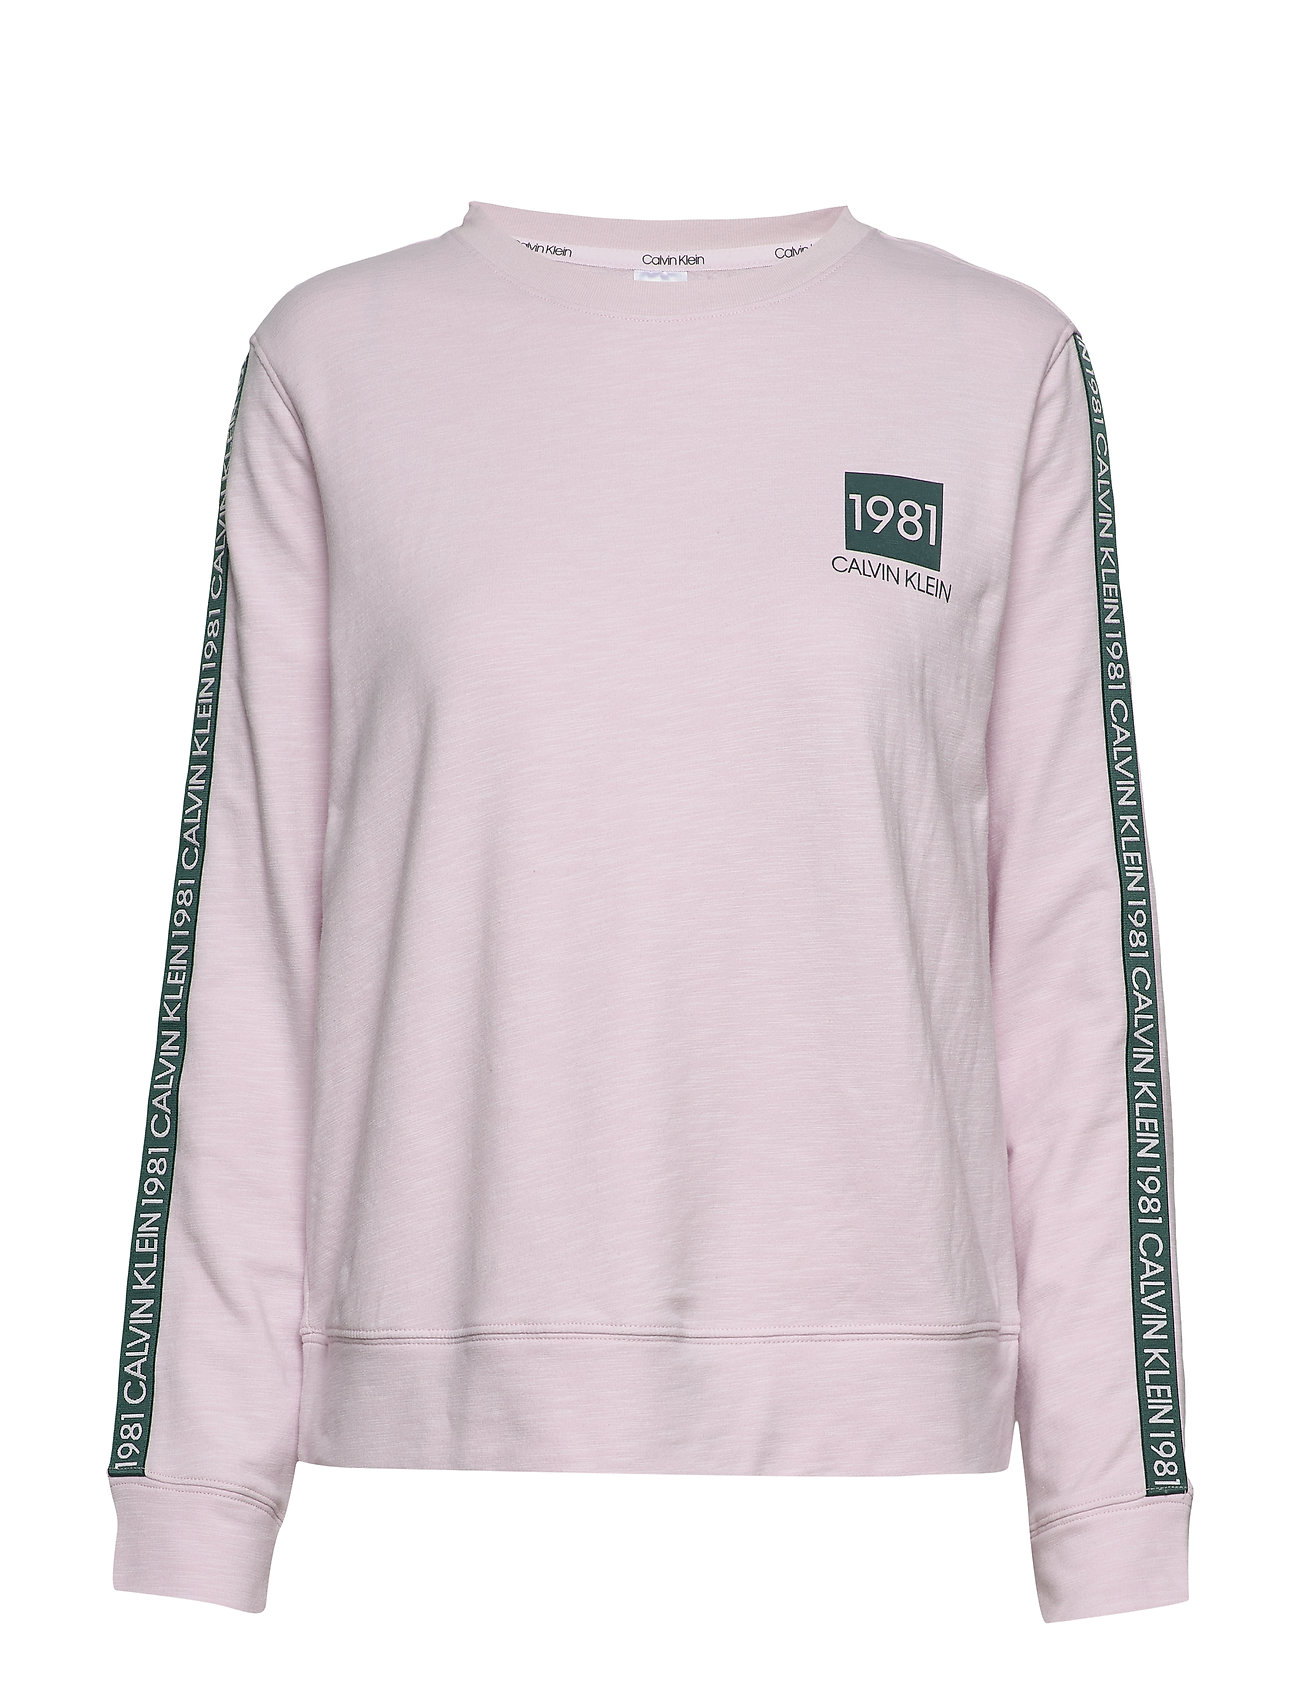 SkyCalvin Sweatshirtpink s L s Klein SkyCalvin Sweatshirtpink L WDY9e2EHI